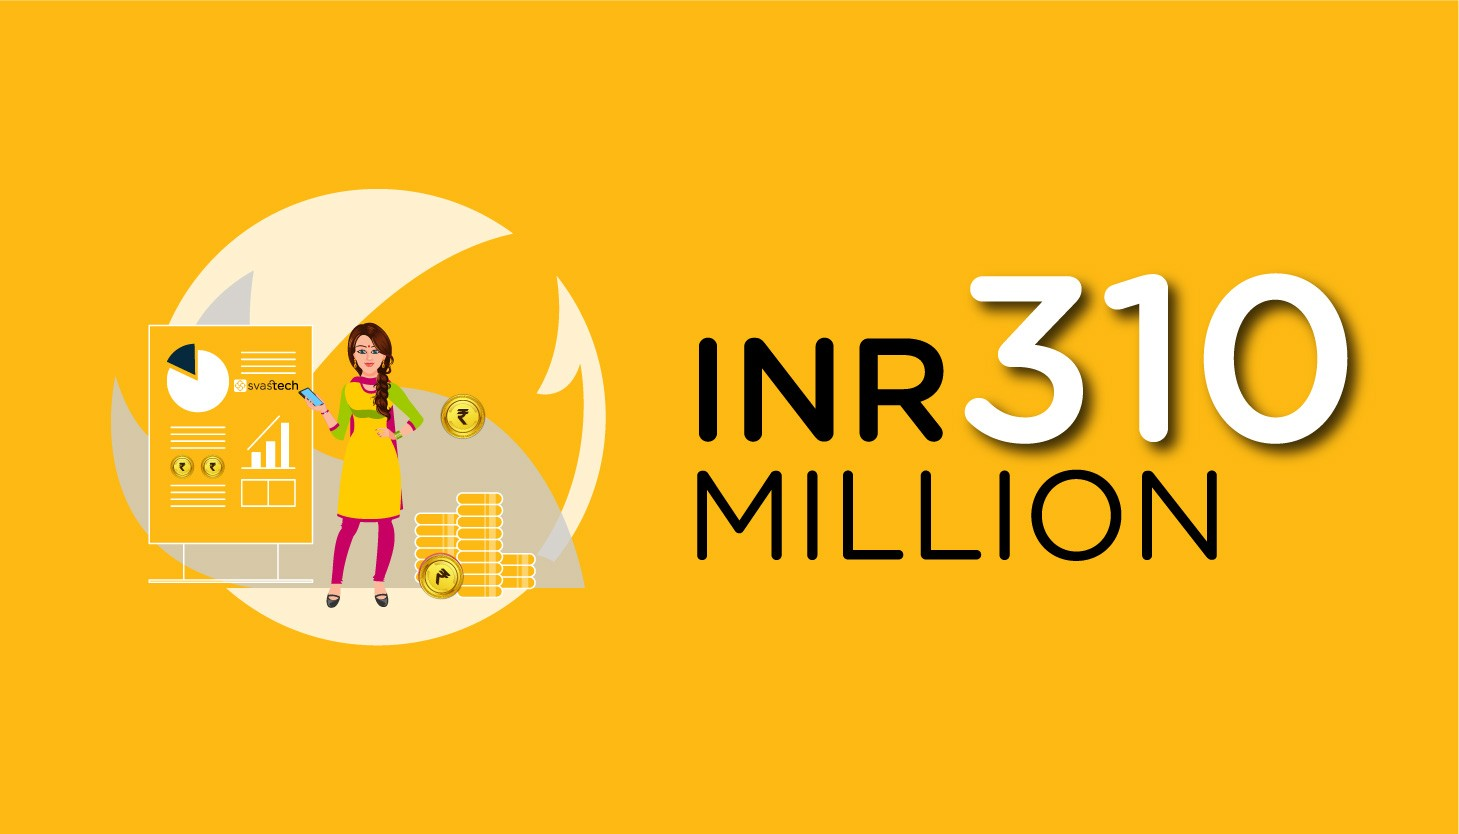 Svasti Microfinance Raises INR 310 Million from Internal Investors